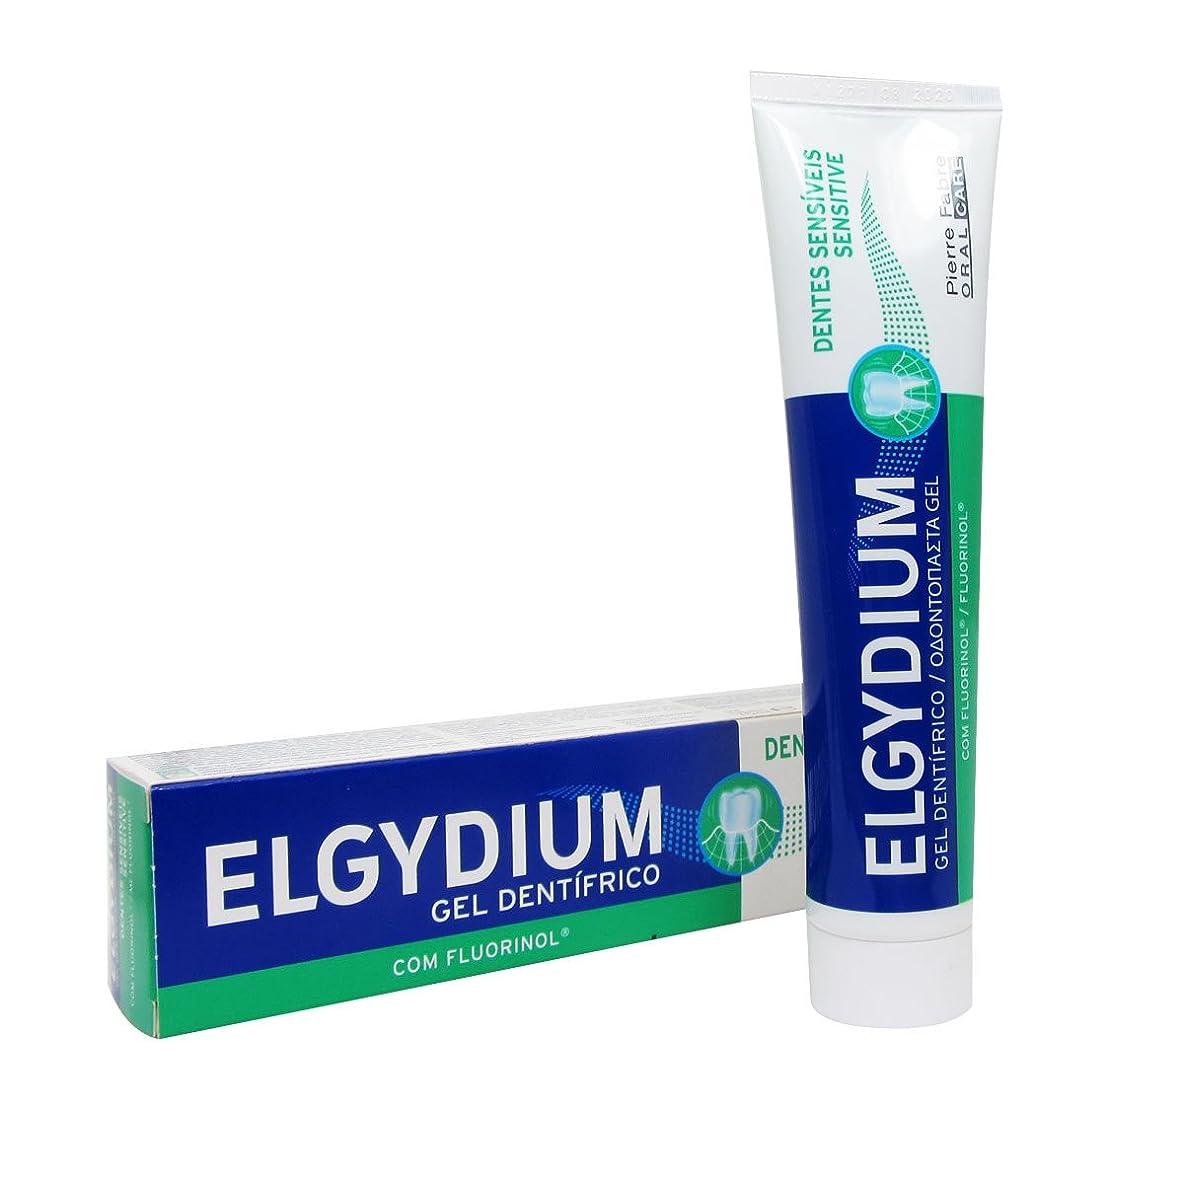 Elgydium Sensitive Teeth Toothpaste Gel 75ml [並行輸入品]